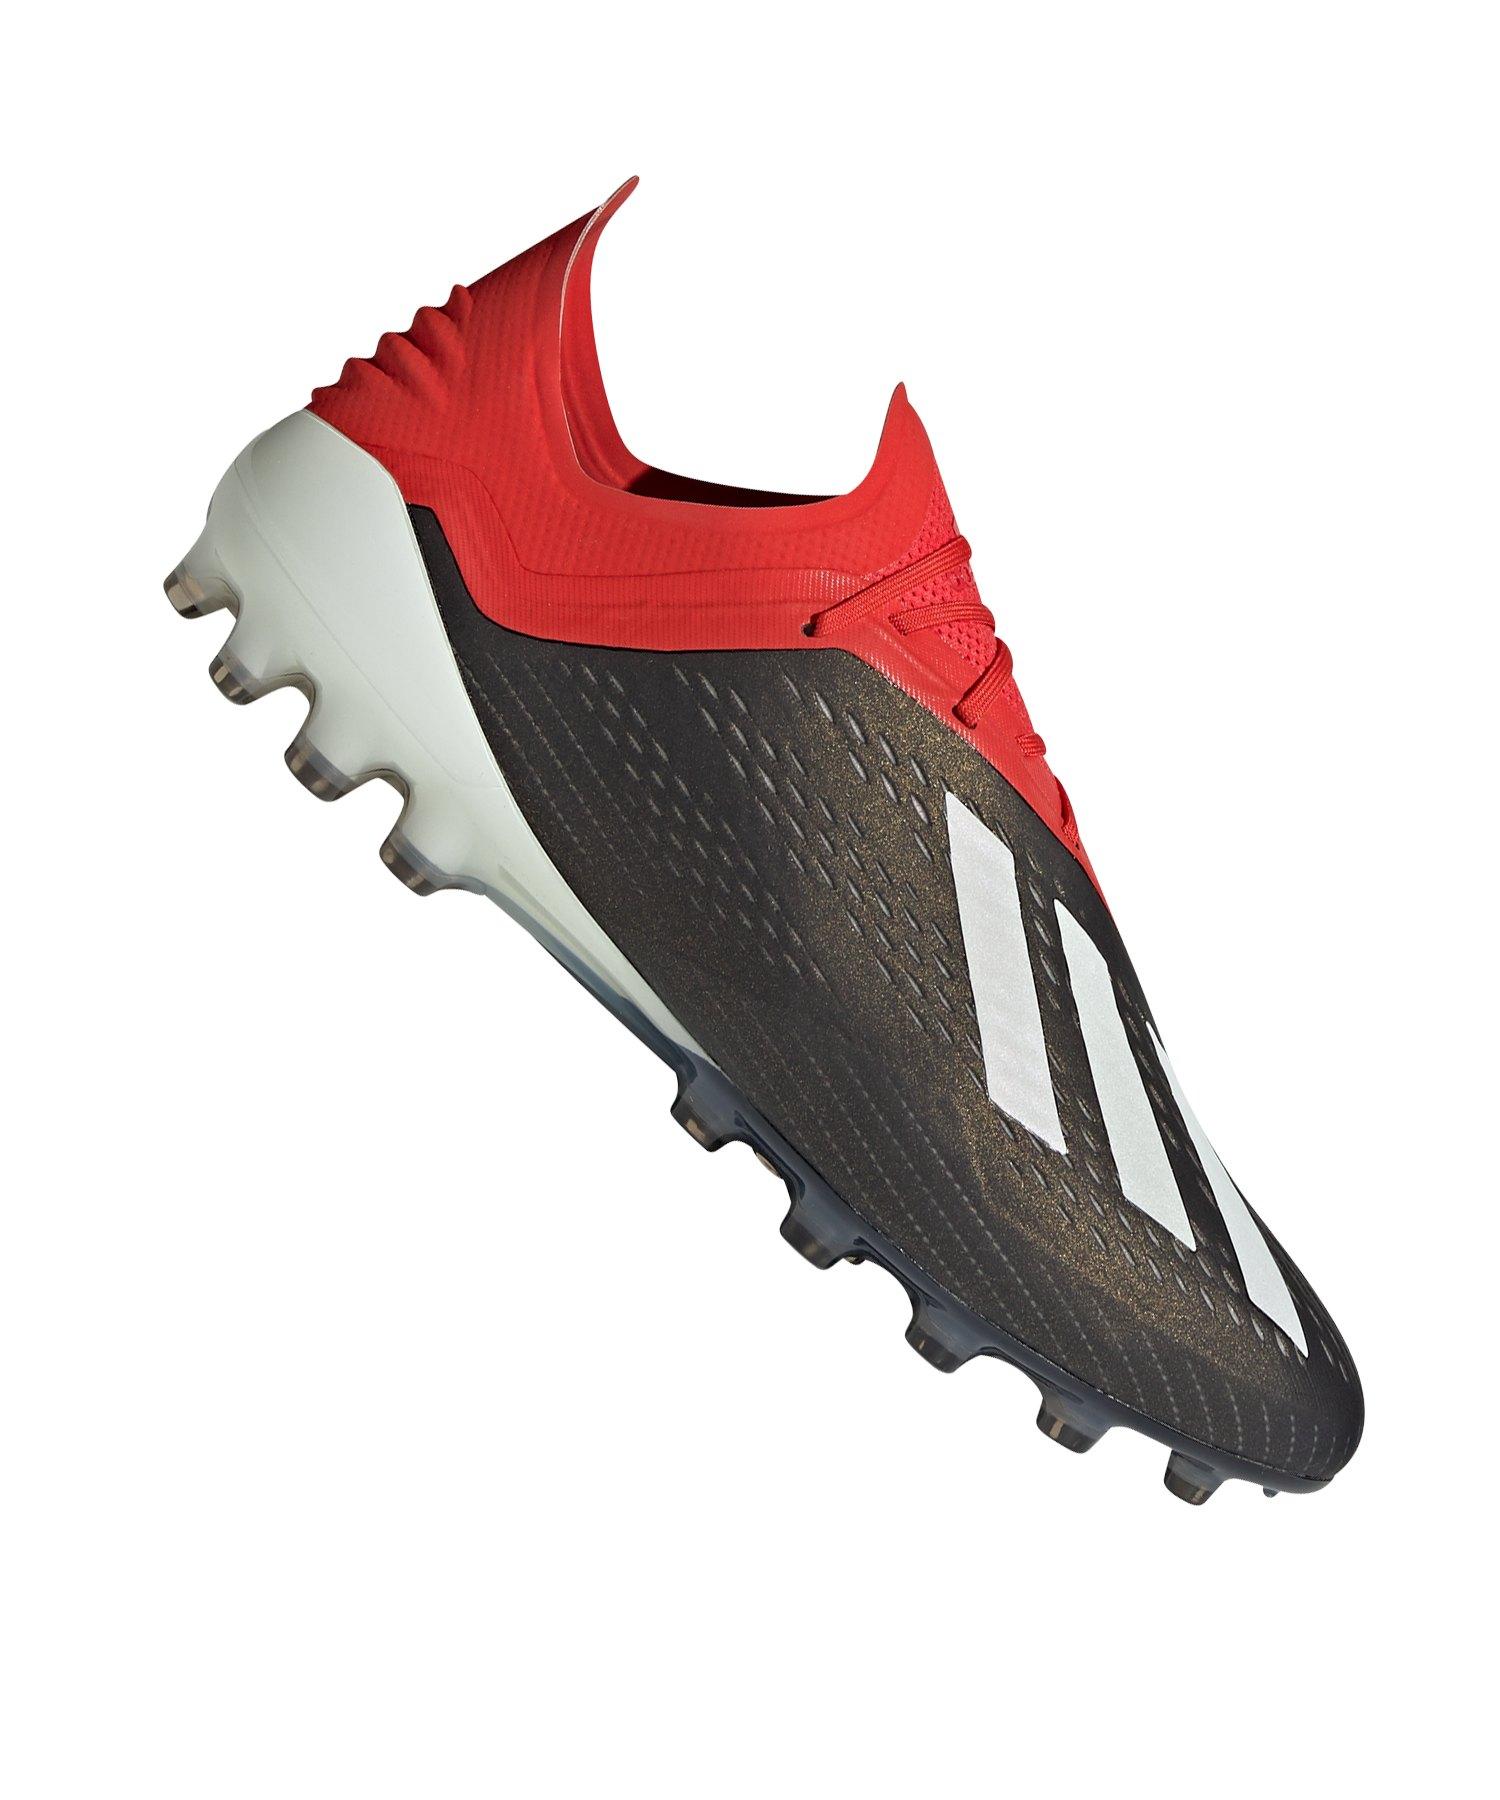 Schwarz Ag Adidas 18 1 X Rot 0wPk8OXn